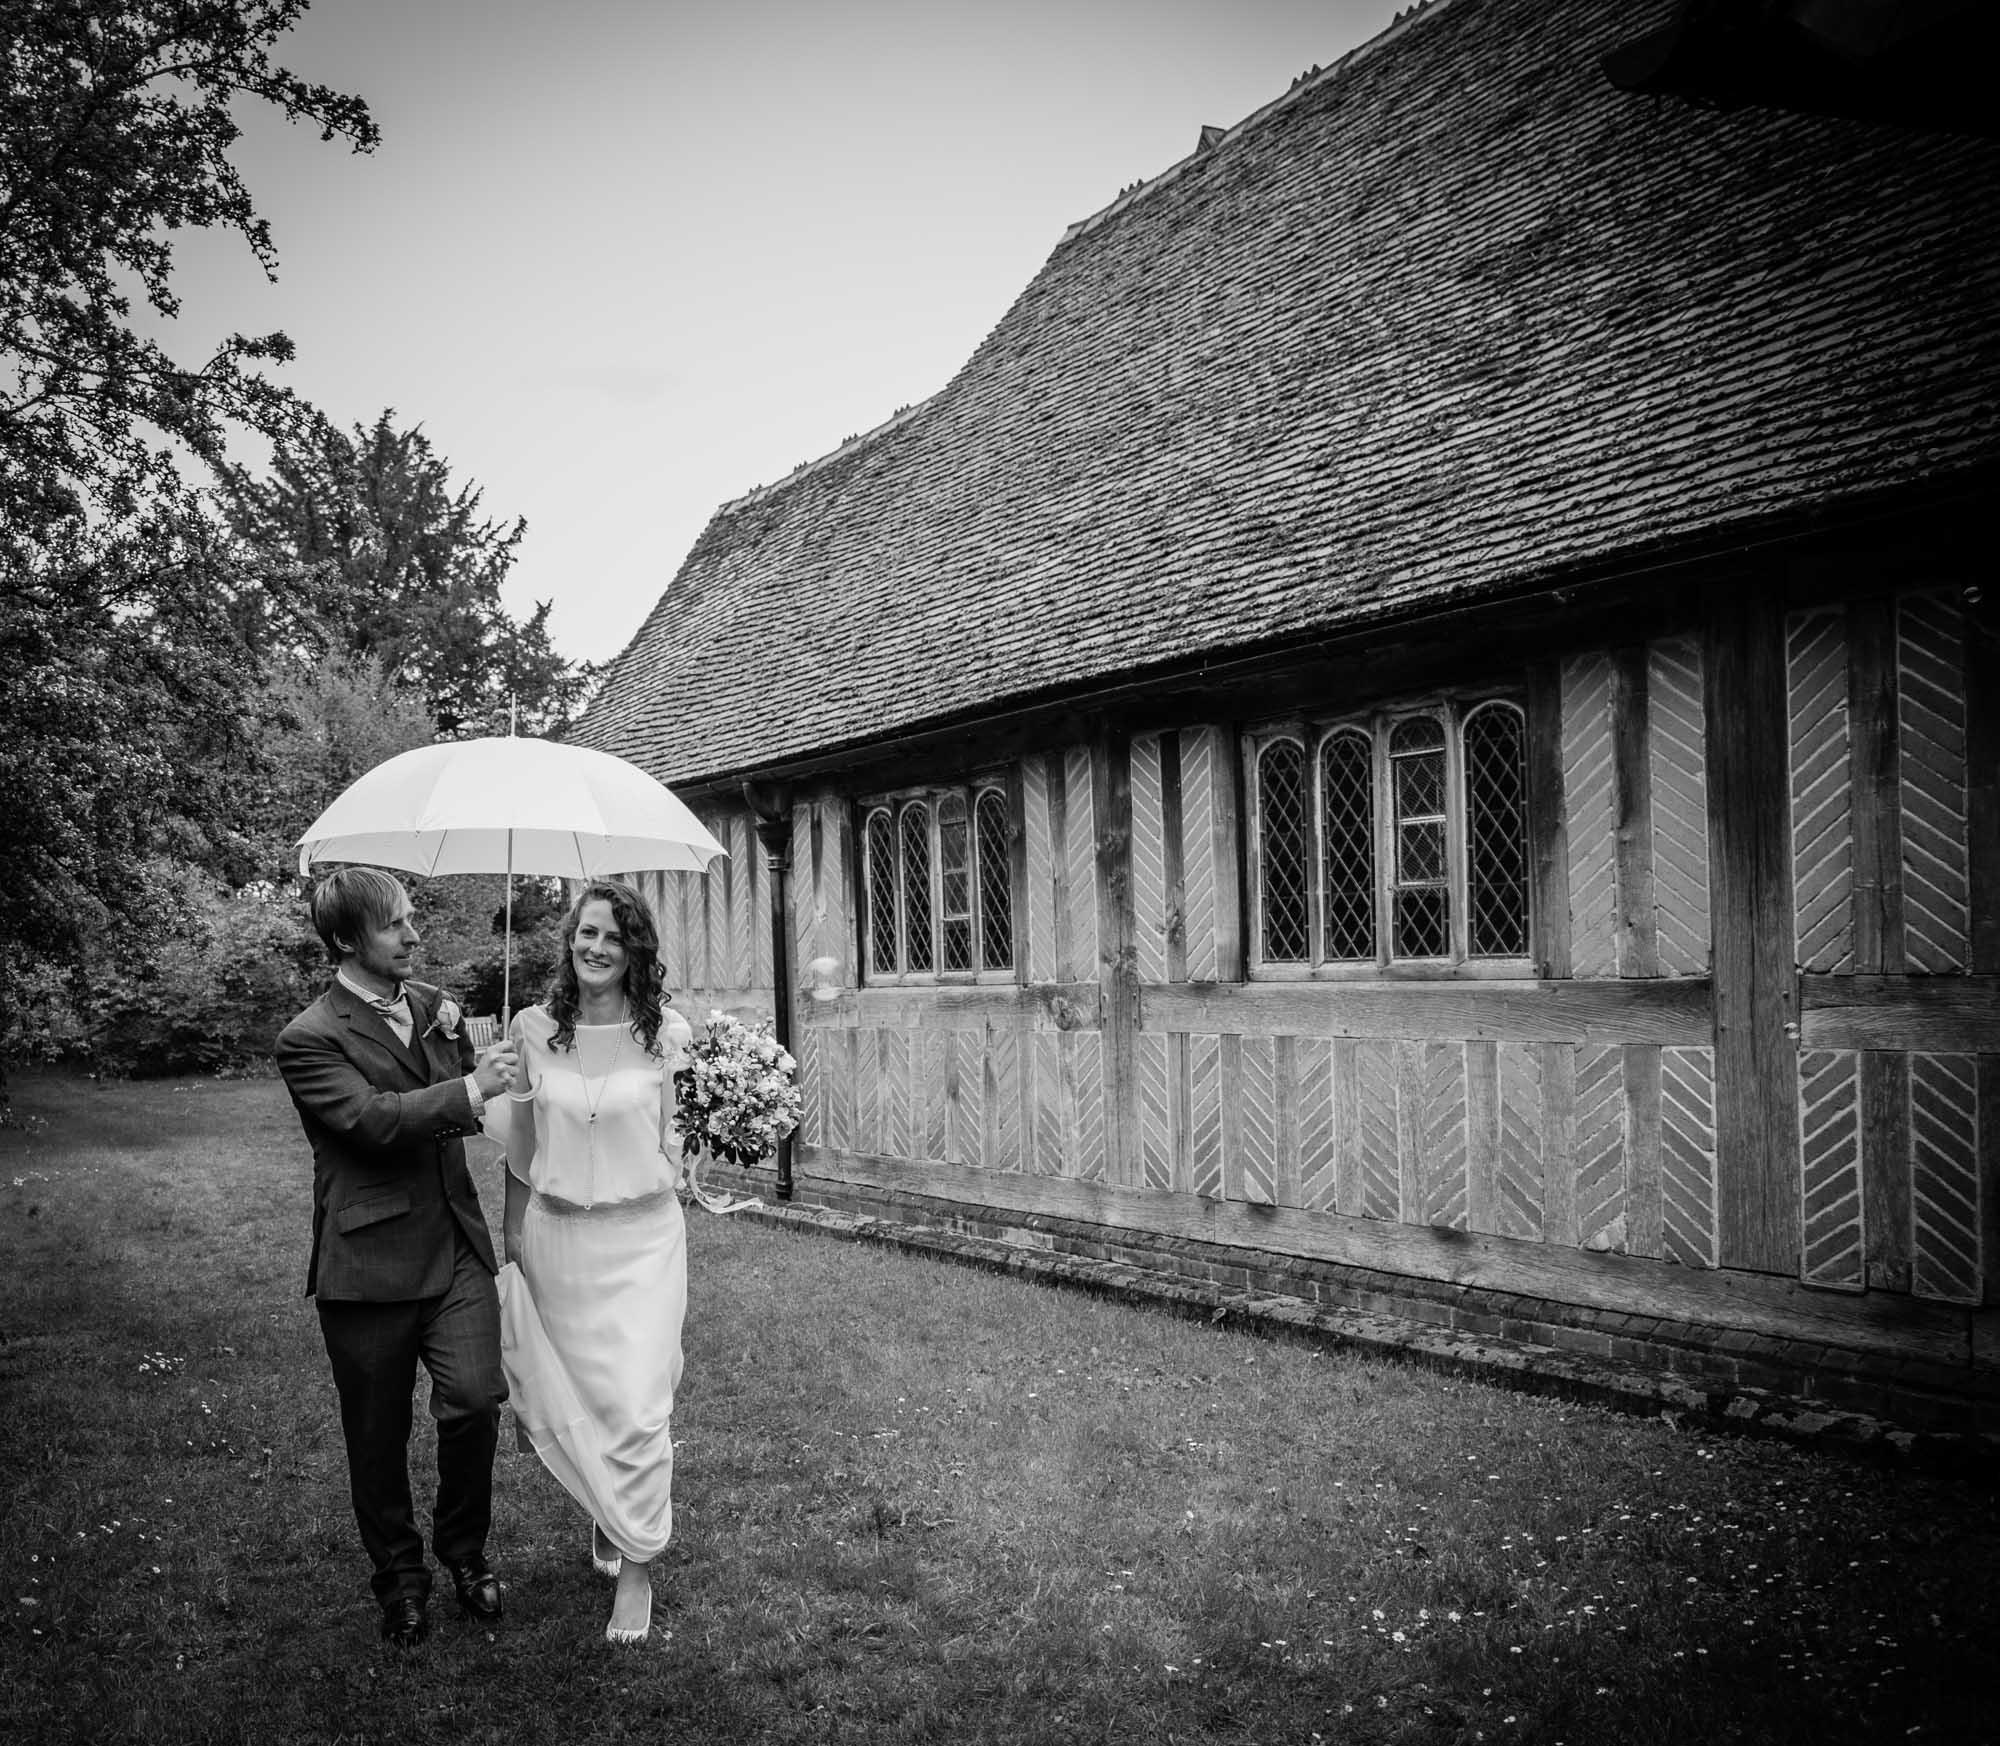 weddings-couples-love-photographer-oxford-london-jonathan-self-photography-94.jpg